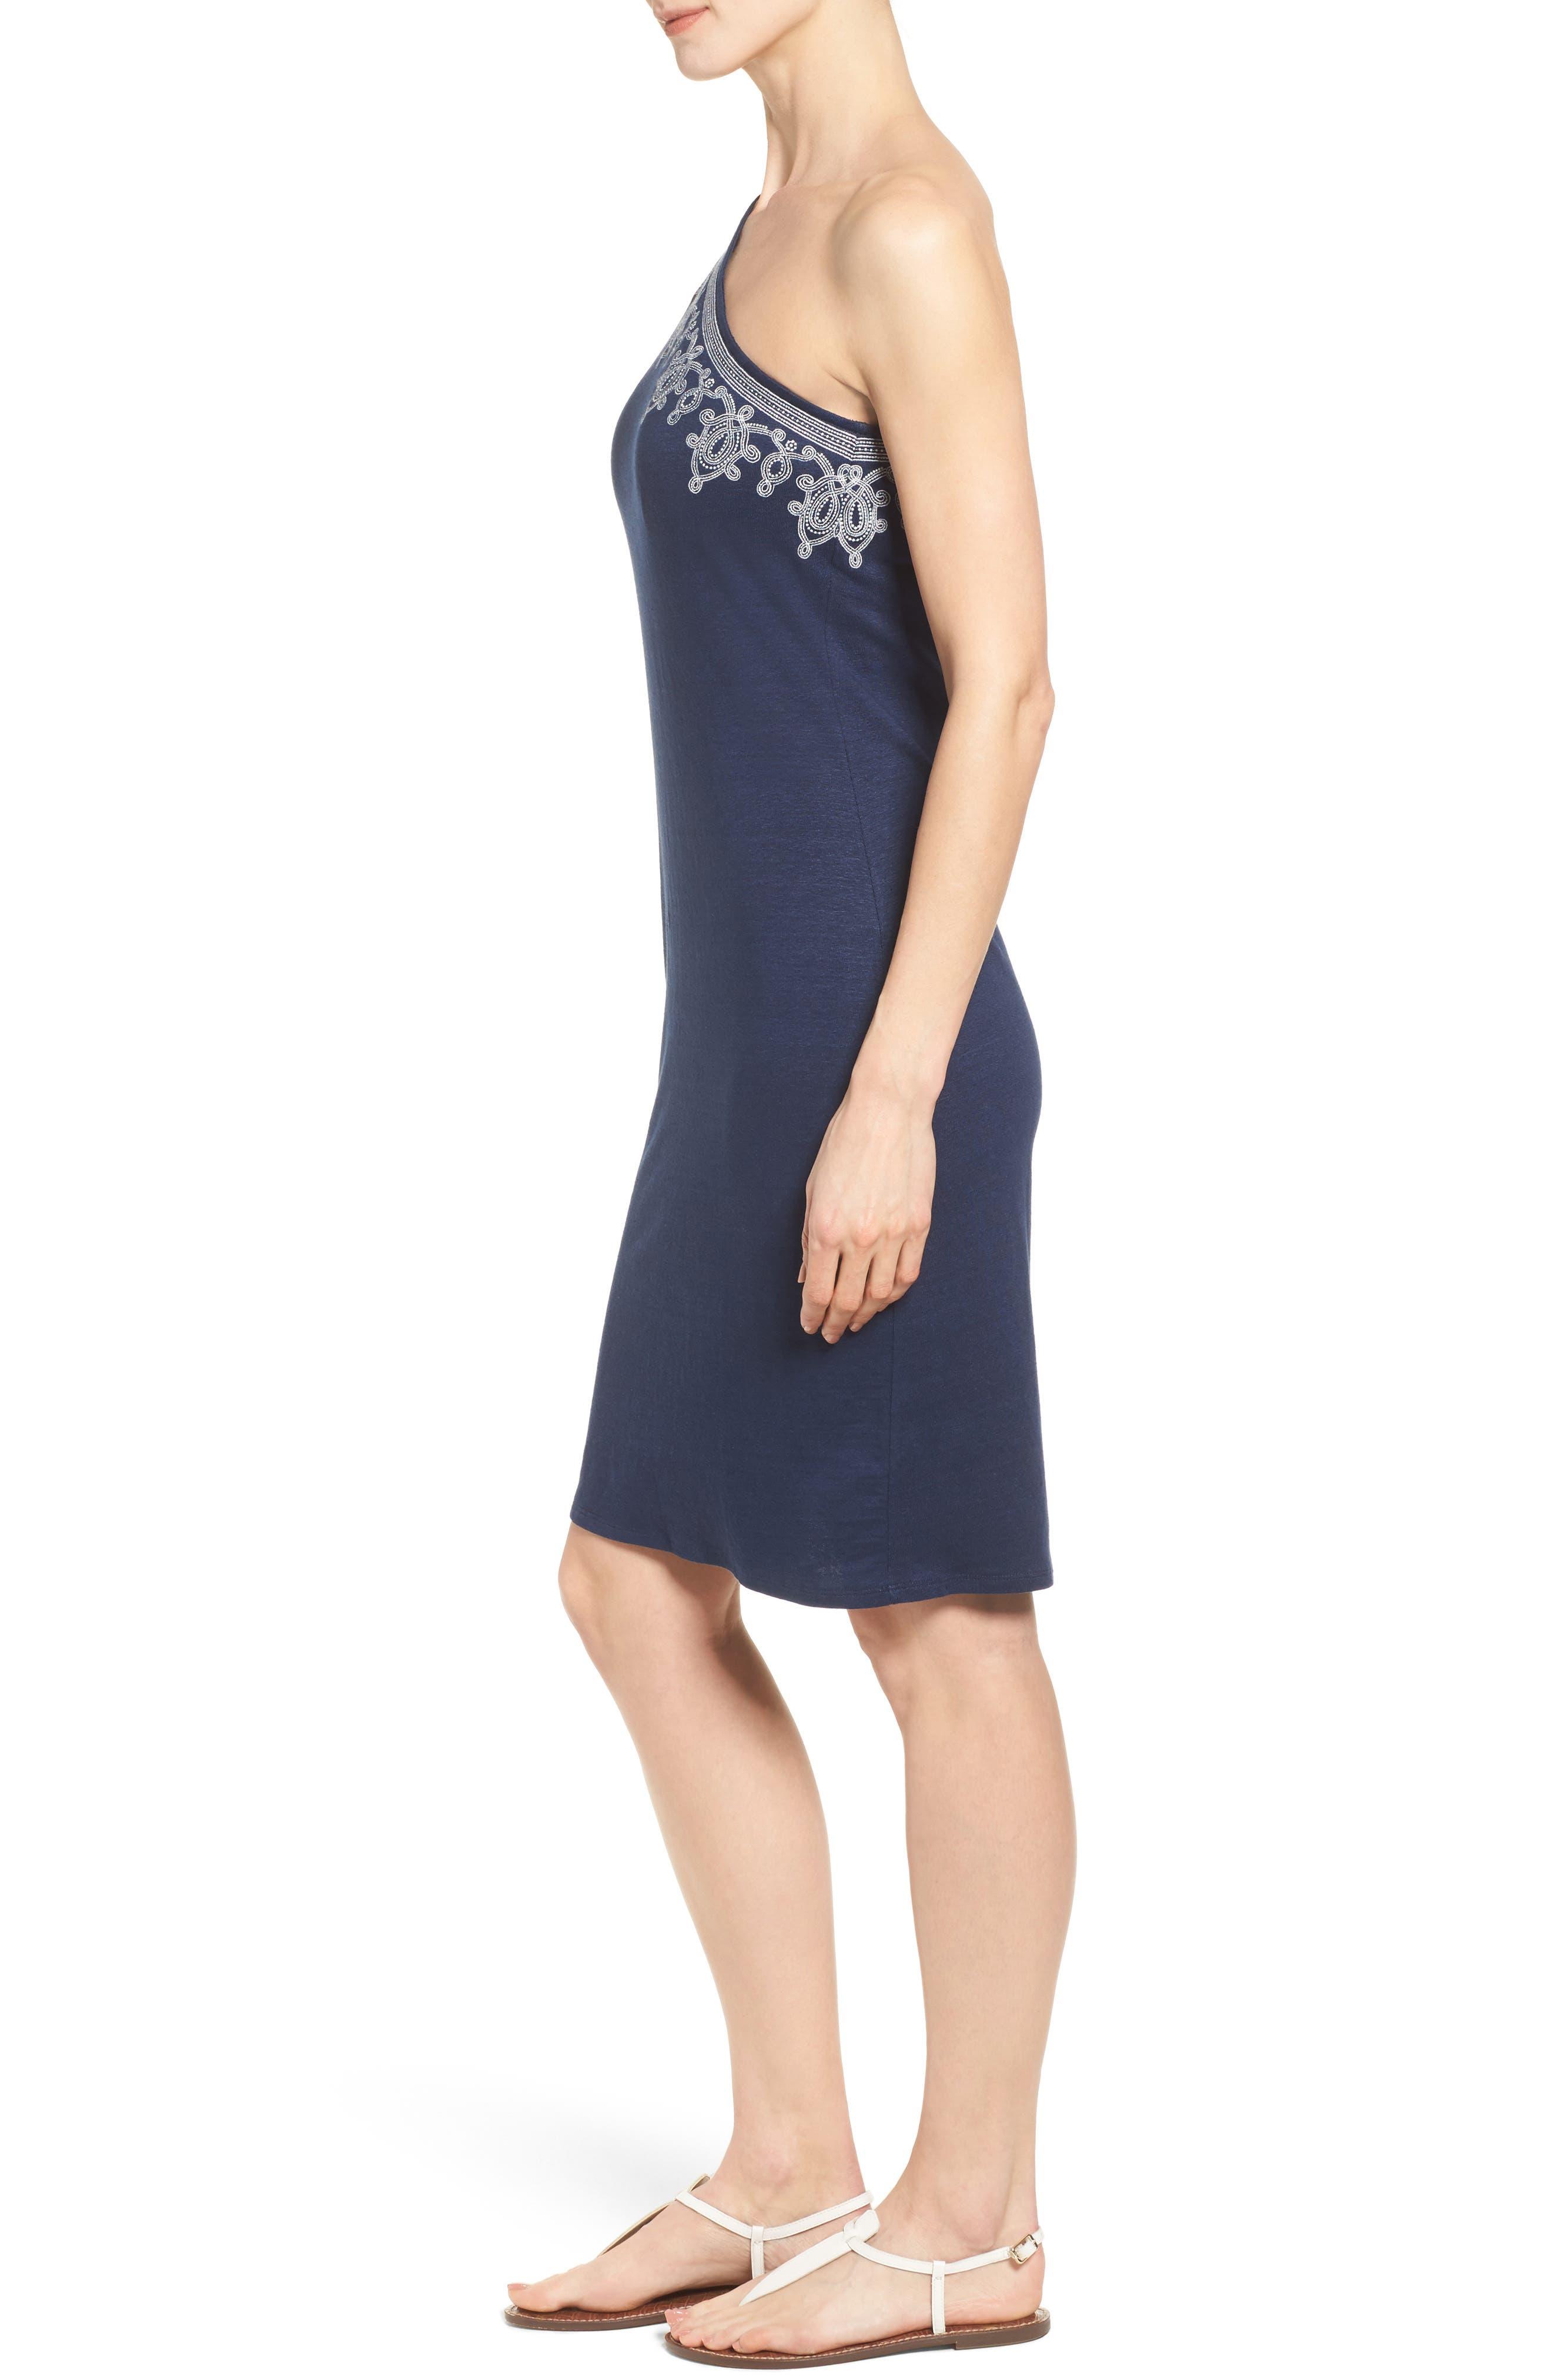 Lovelin One-Shoulder Dress,                             Alternate thumbnail 3, color,                             Ocean Deep